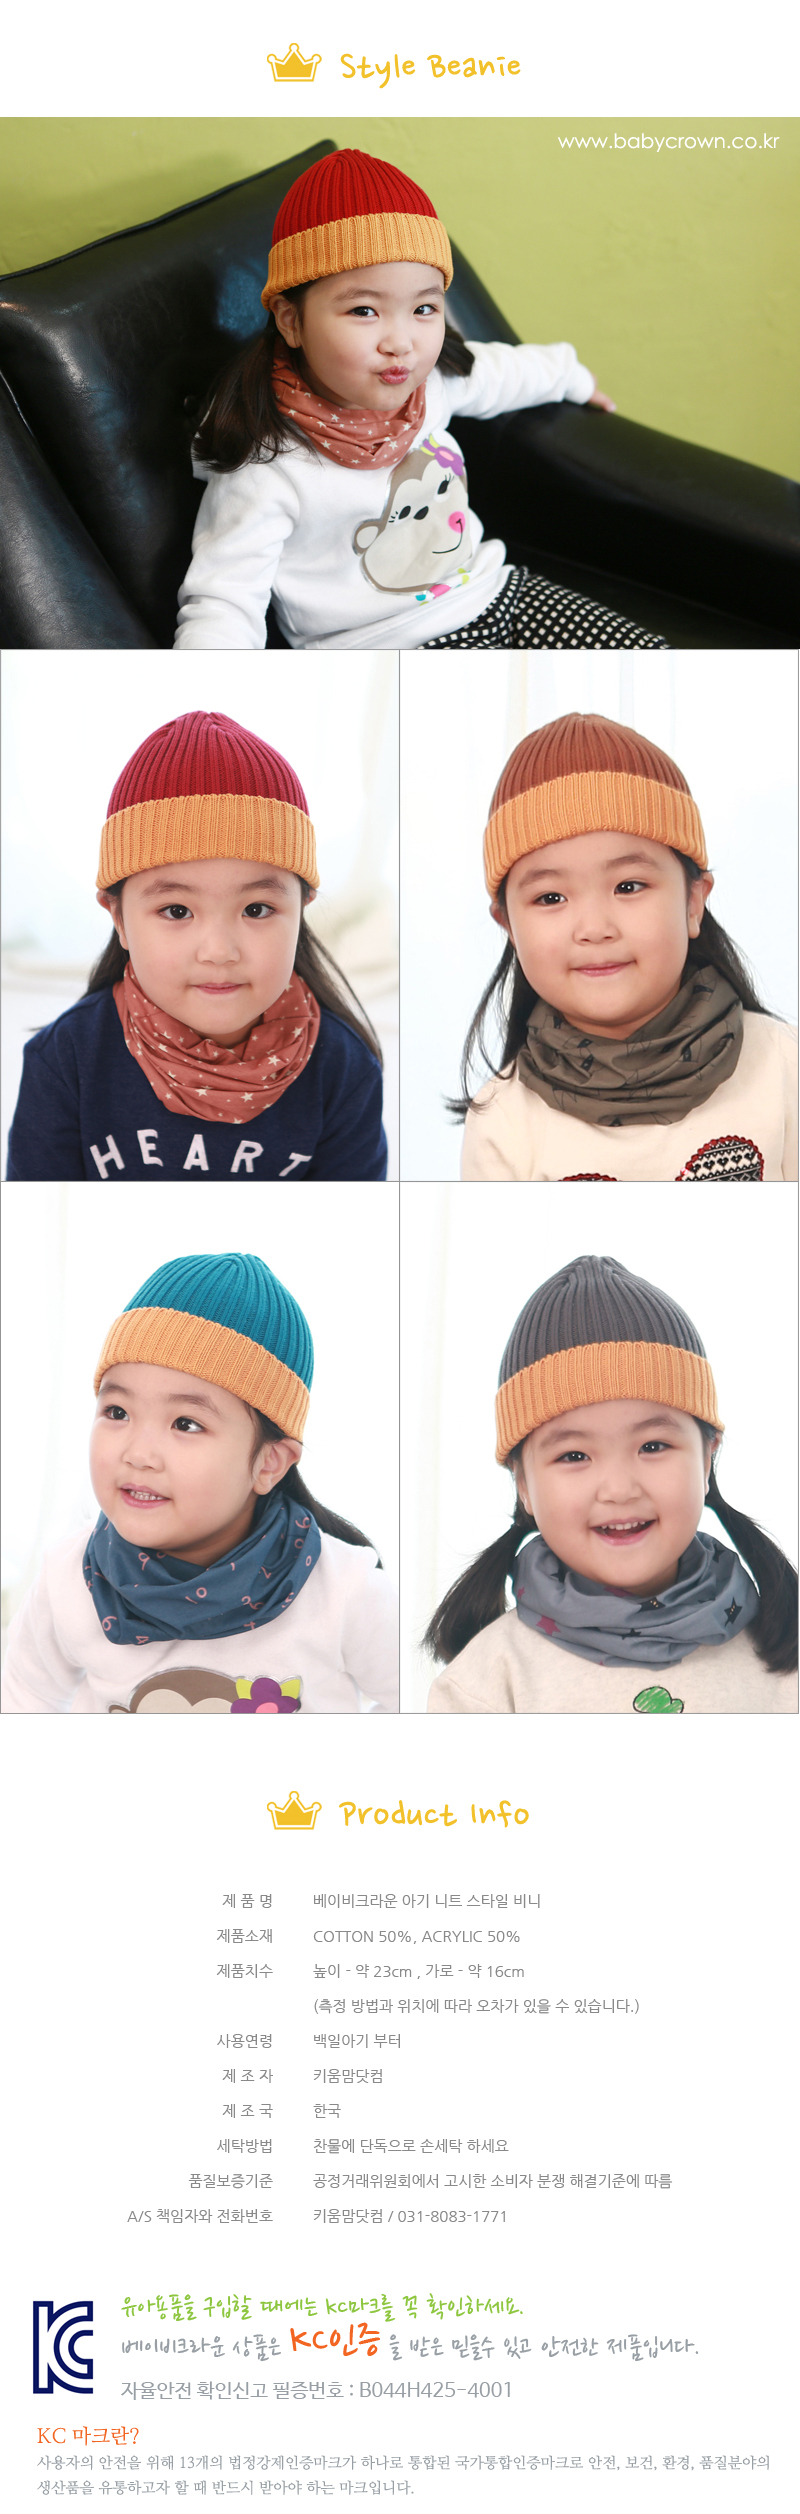 [ Babycrown ] [婴儿官方]婴儿针织帽